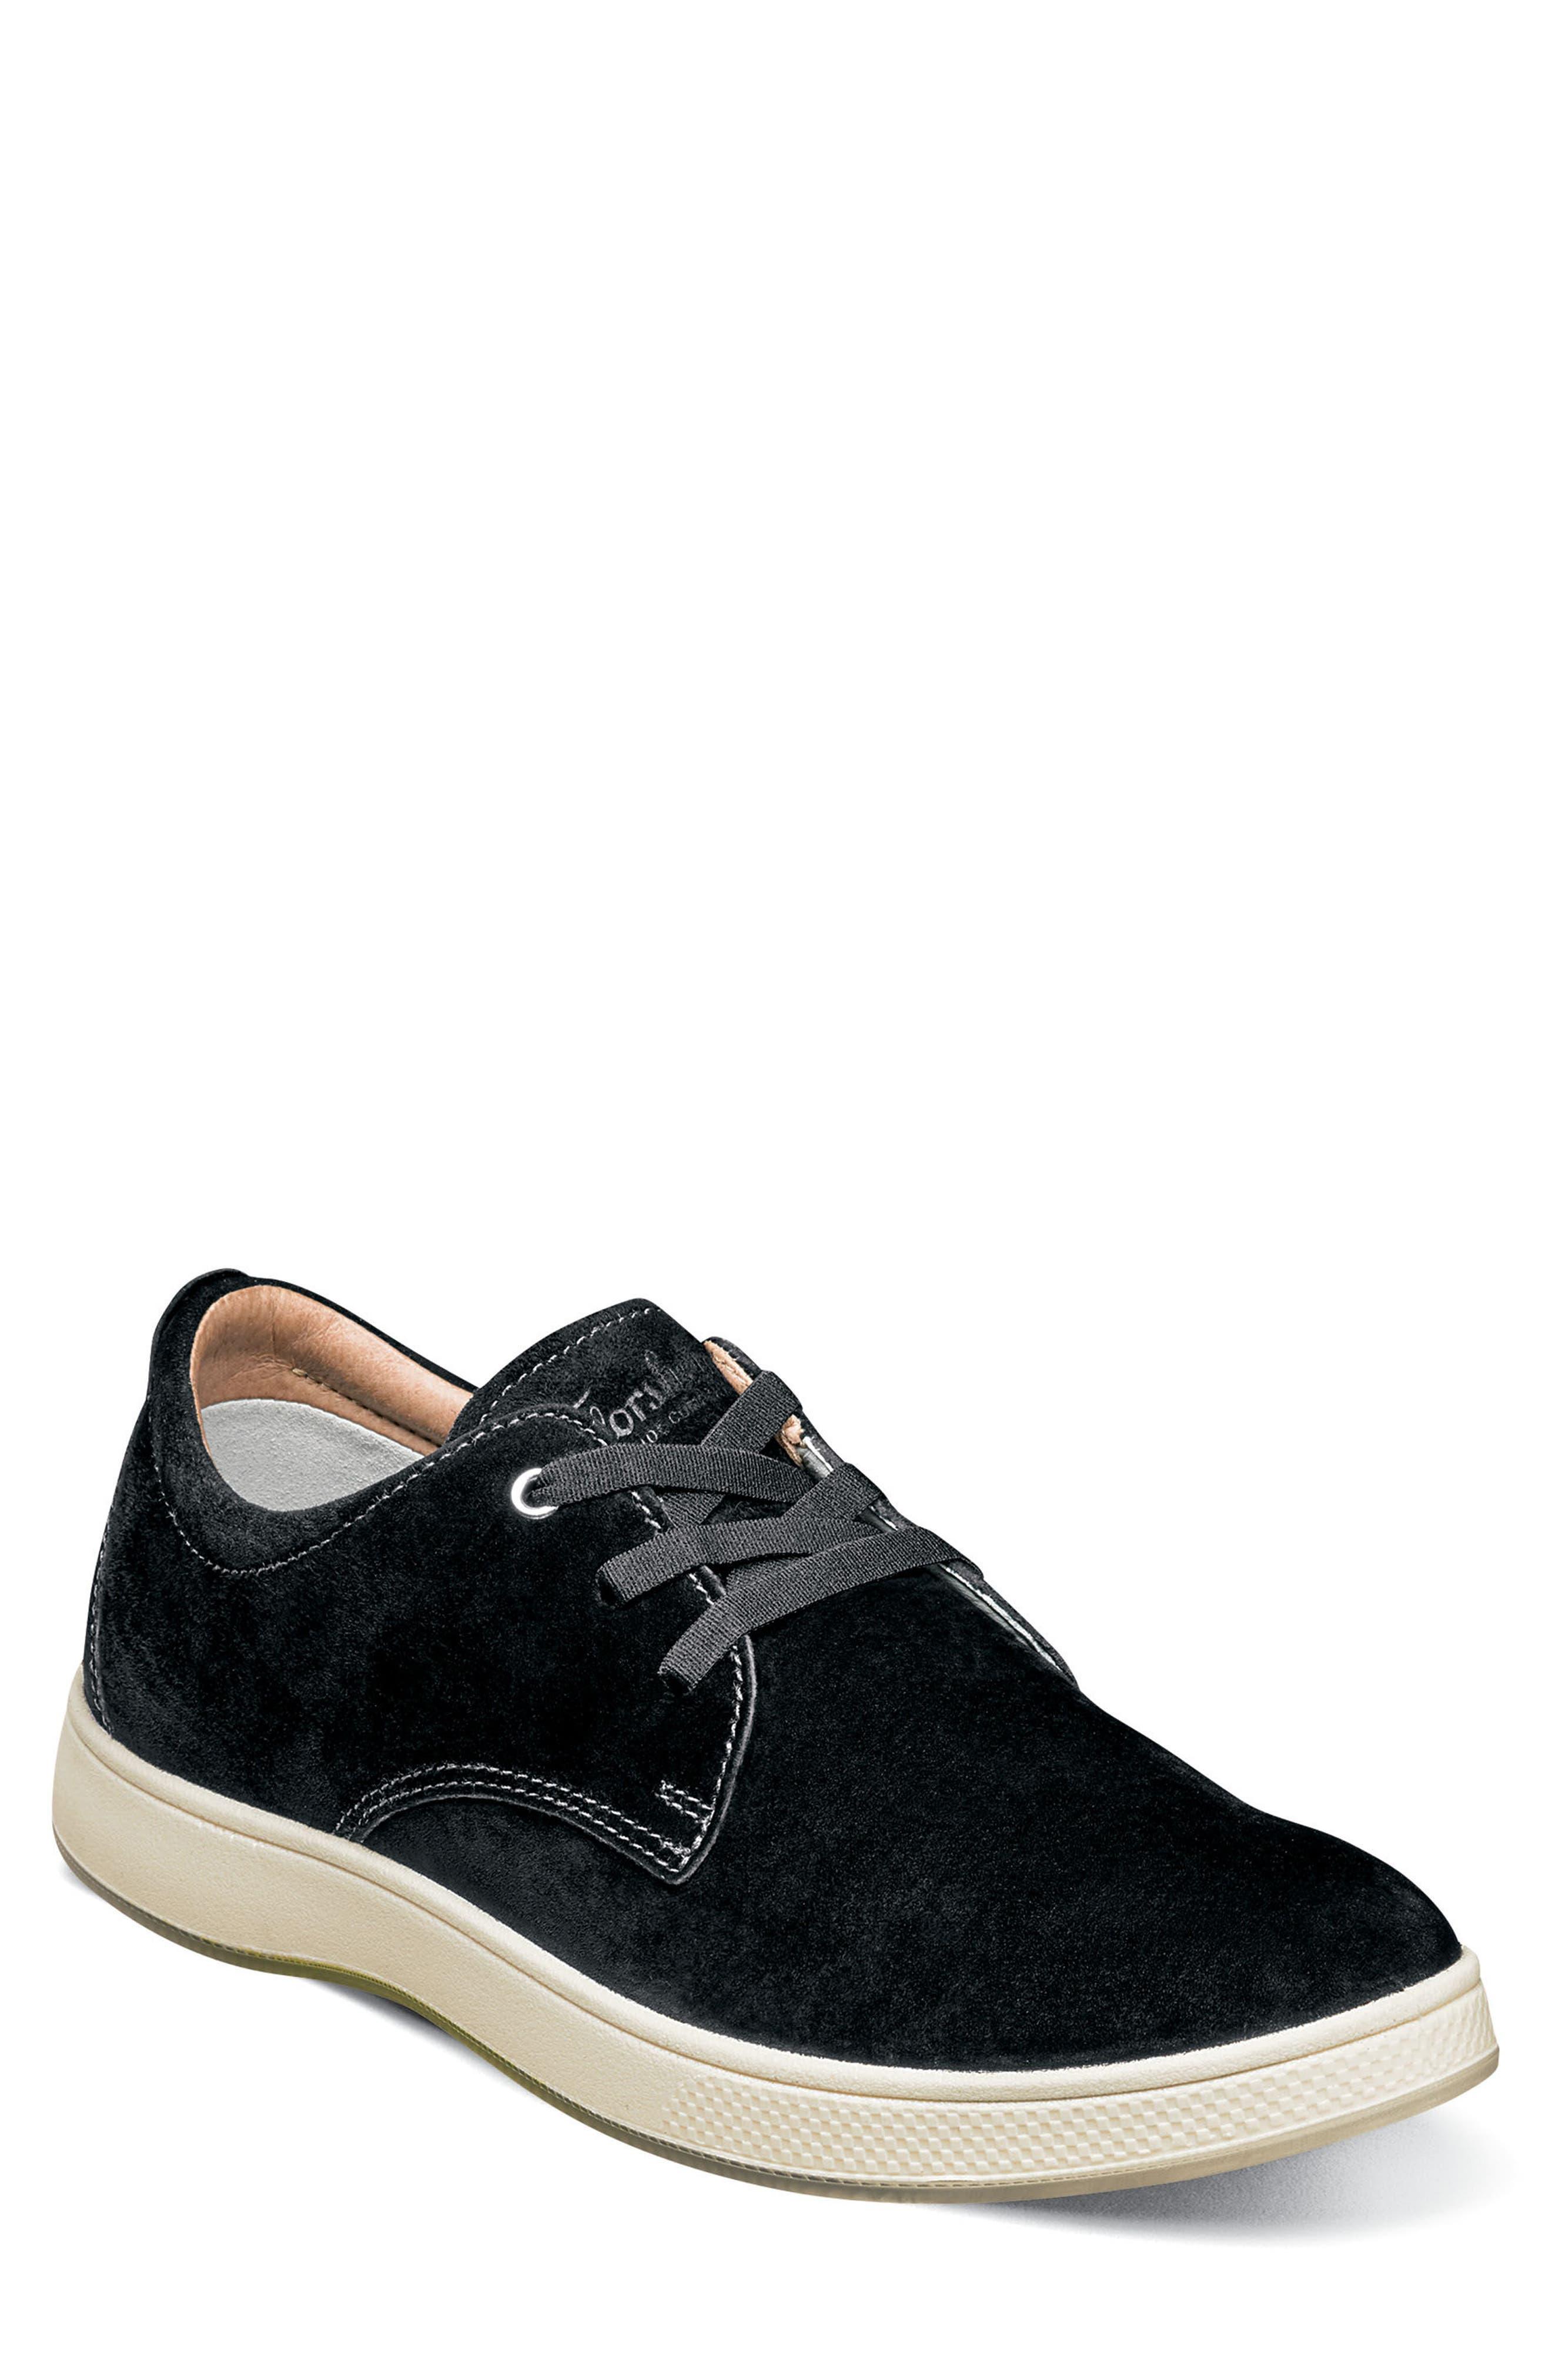 Edge 3 Eye Sneaker,                         Main,                         color,